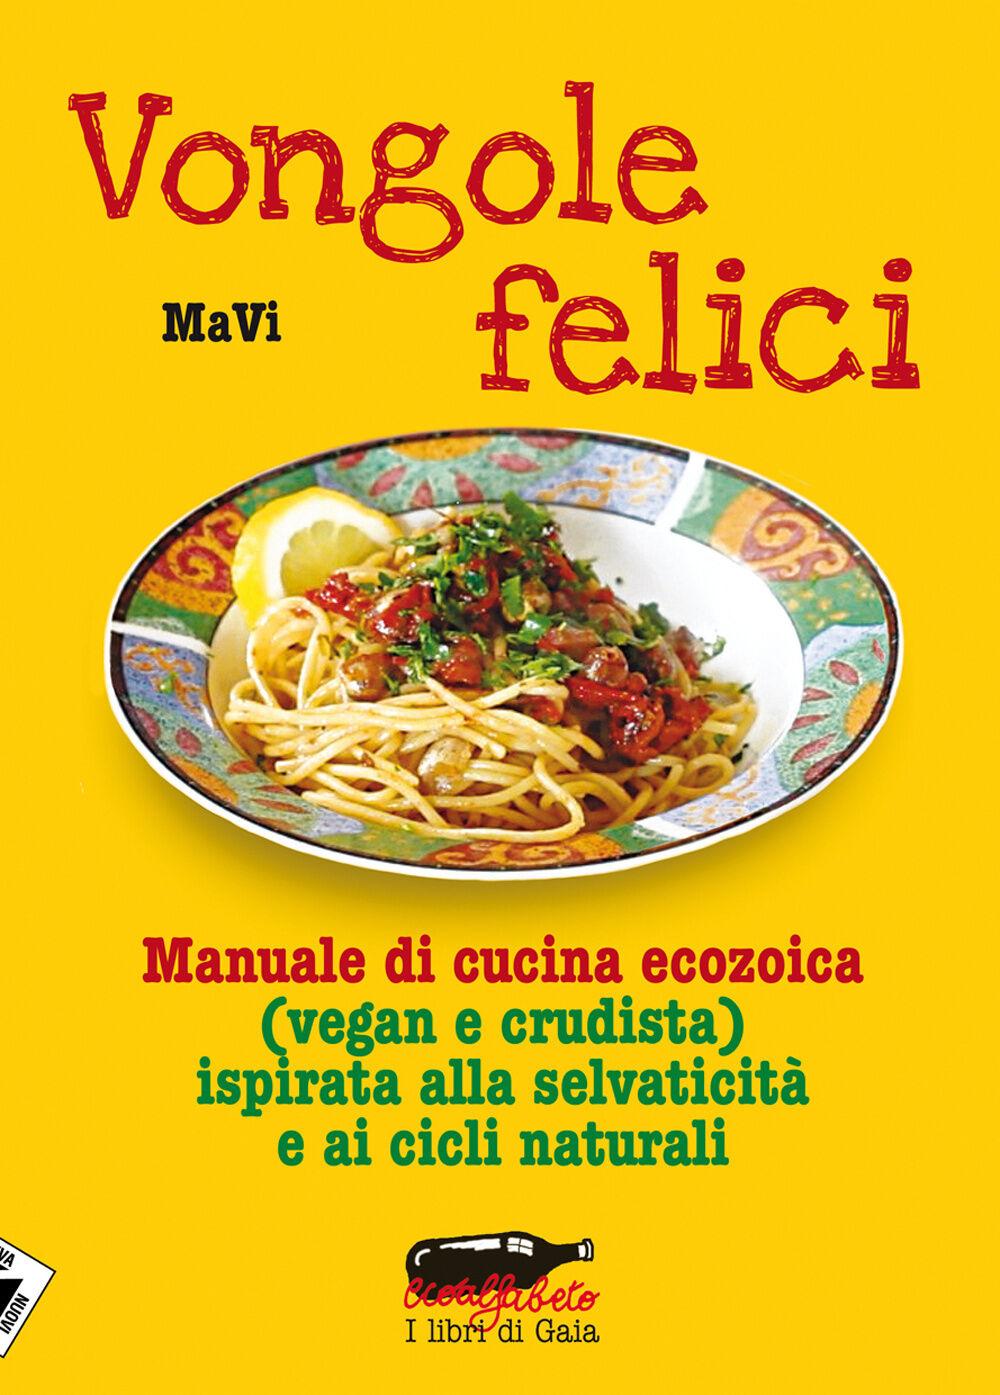 Vongole felici. Manuale di cucina ecozoica (vegan e crudista) ispirata alla selvaticità e ai cicli naturali